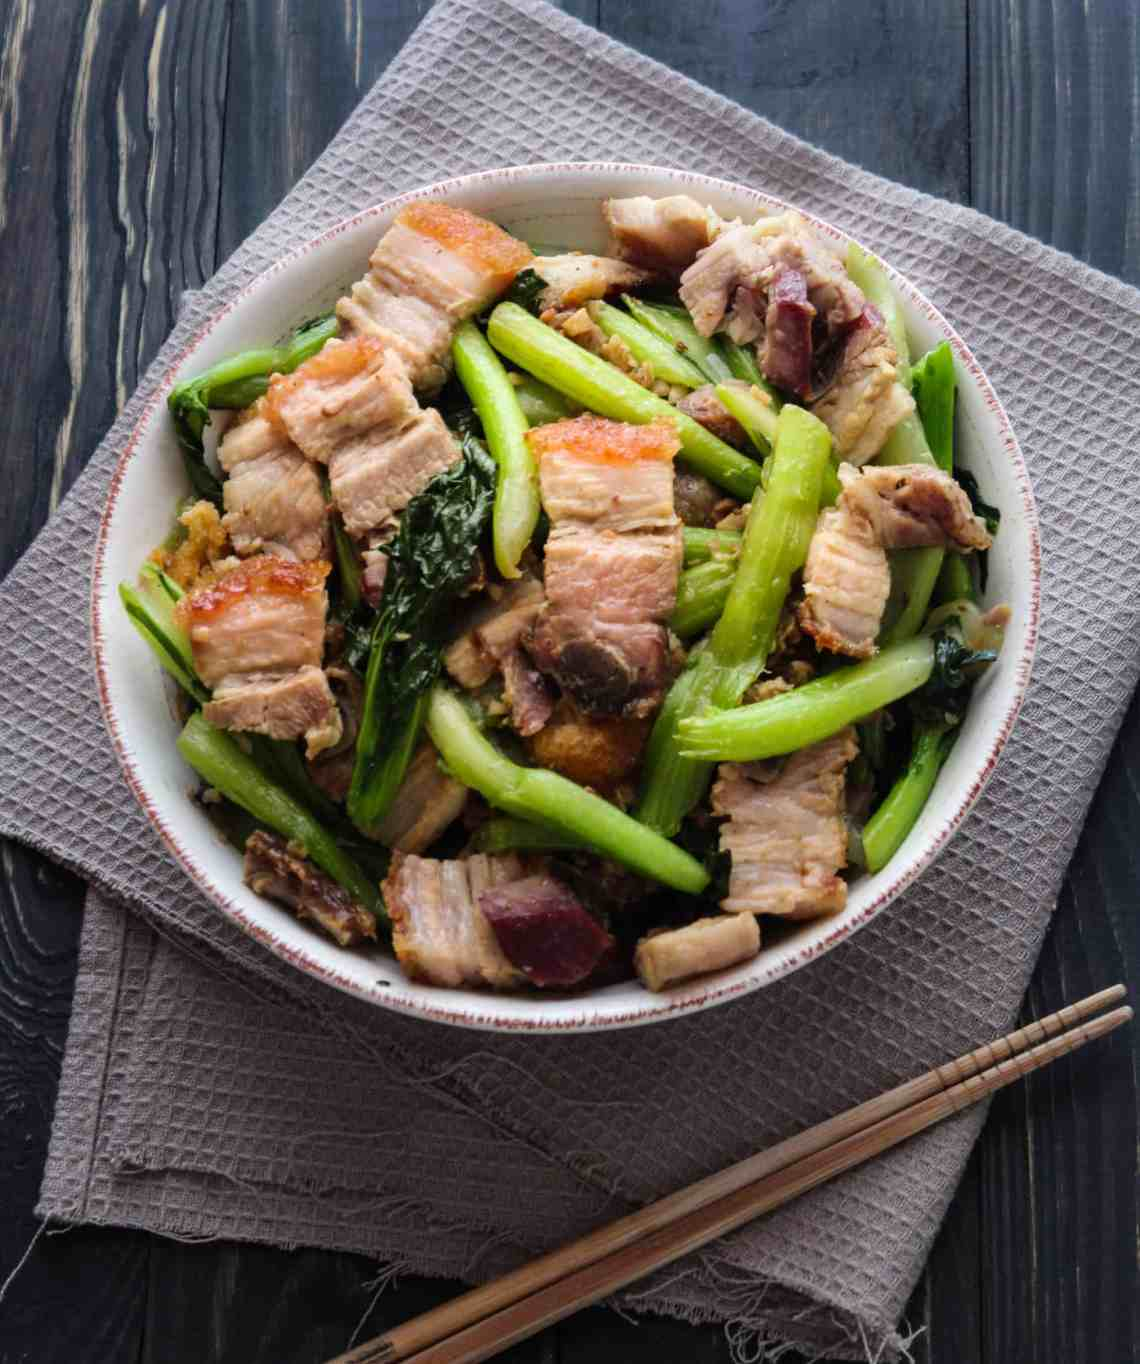 Crispy Pork Belly Stir Fried with Asian Greens - Wok and Kin